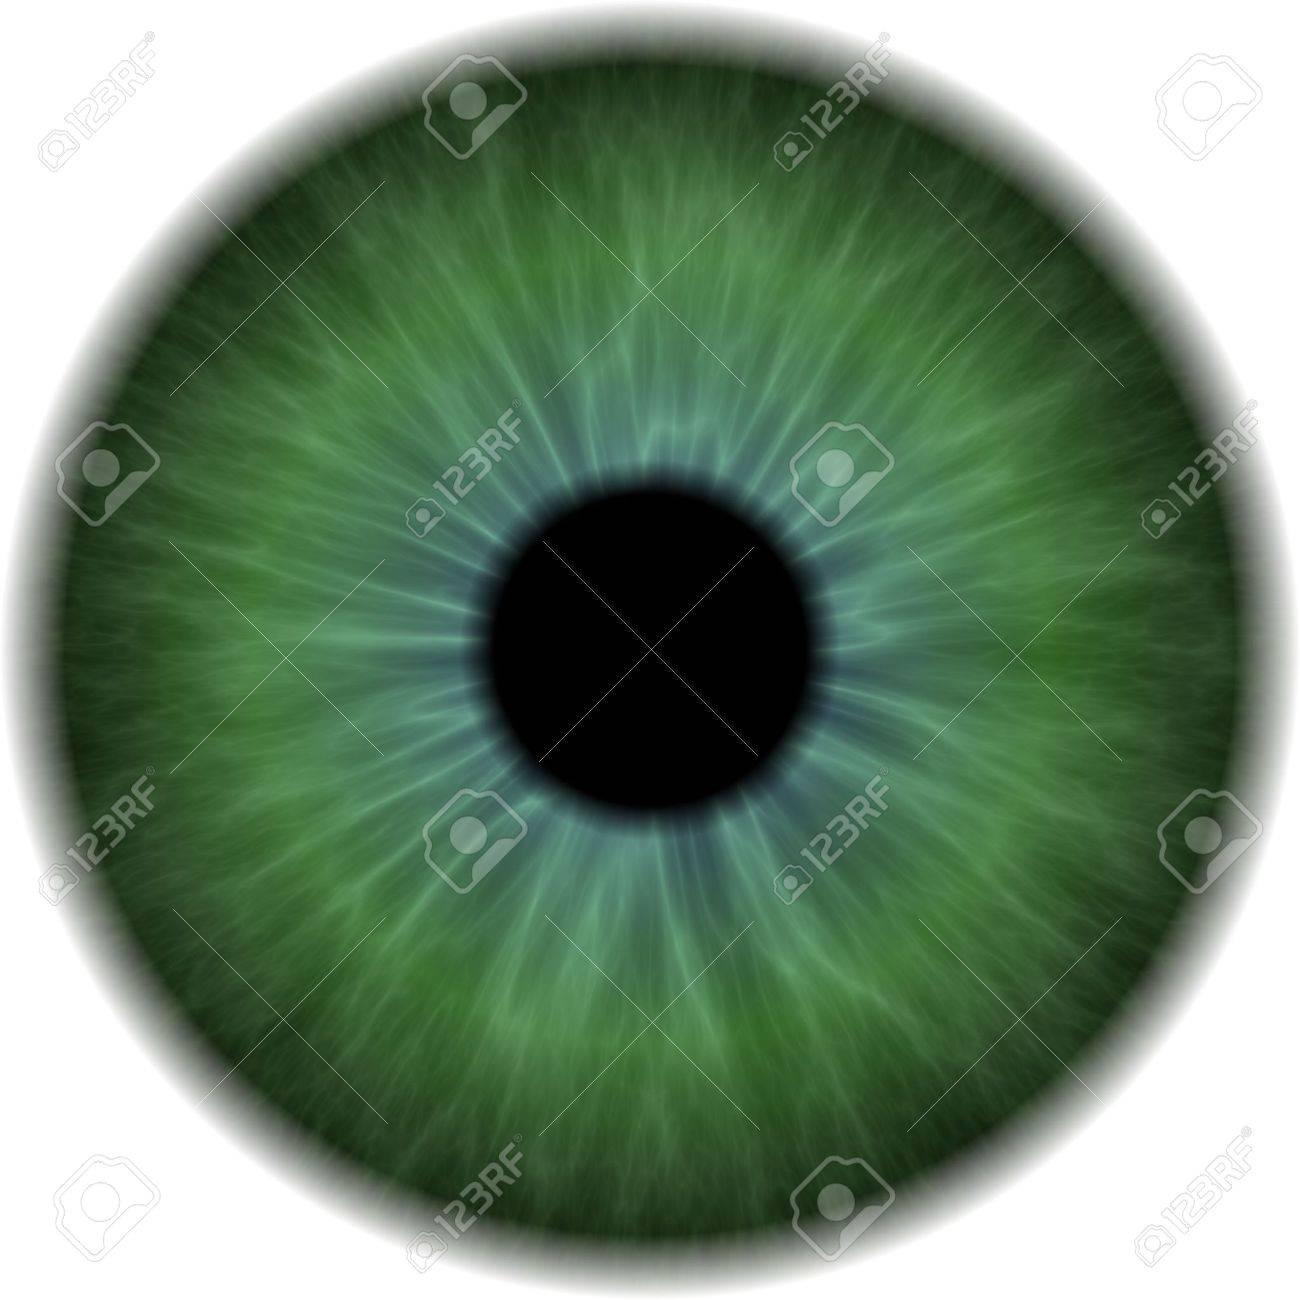 Eyeball Clip Art Isolated On A White Background Stock Photo ...